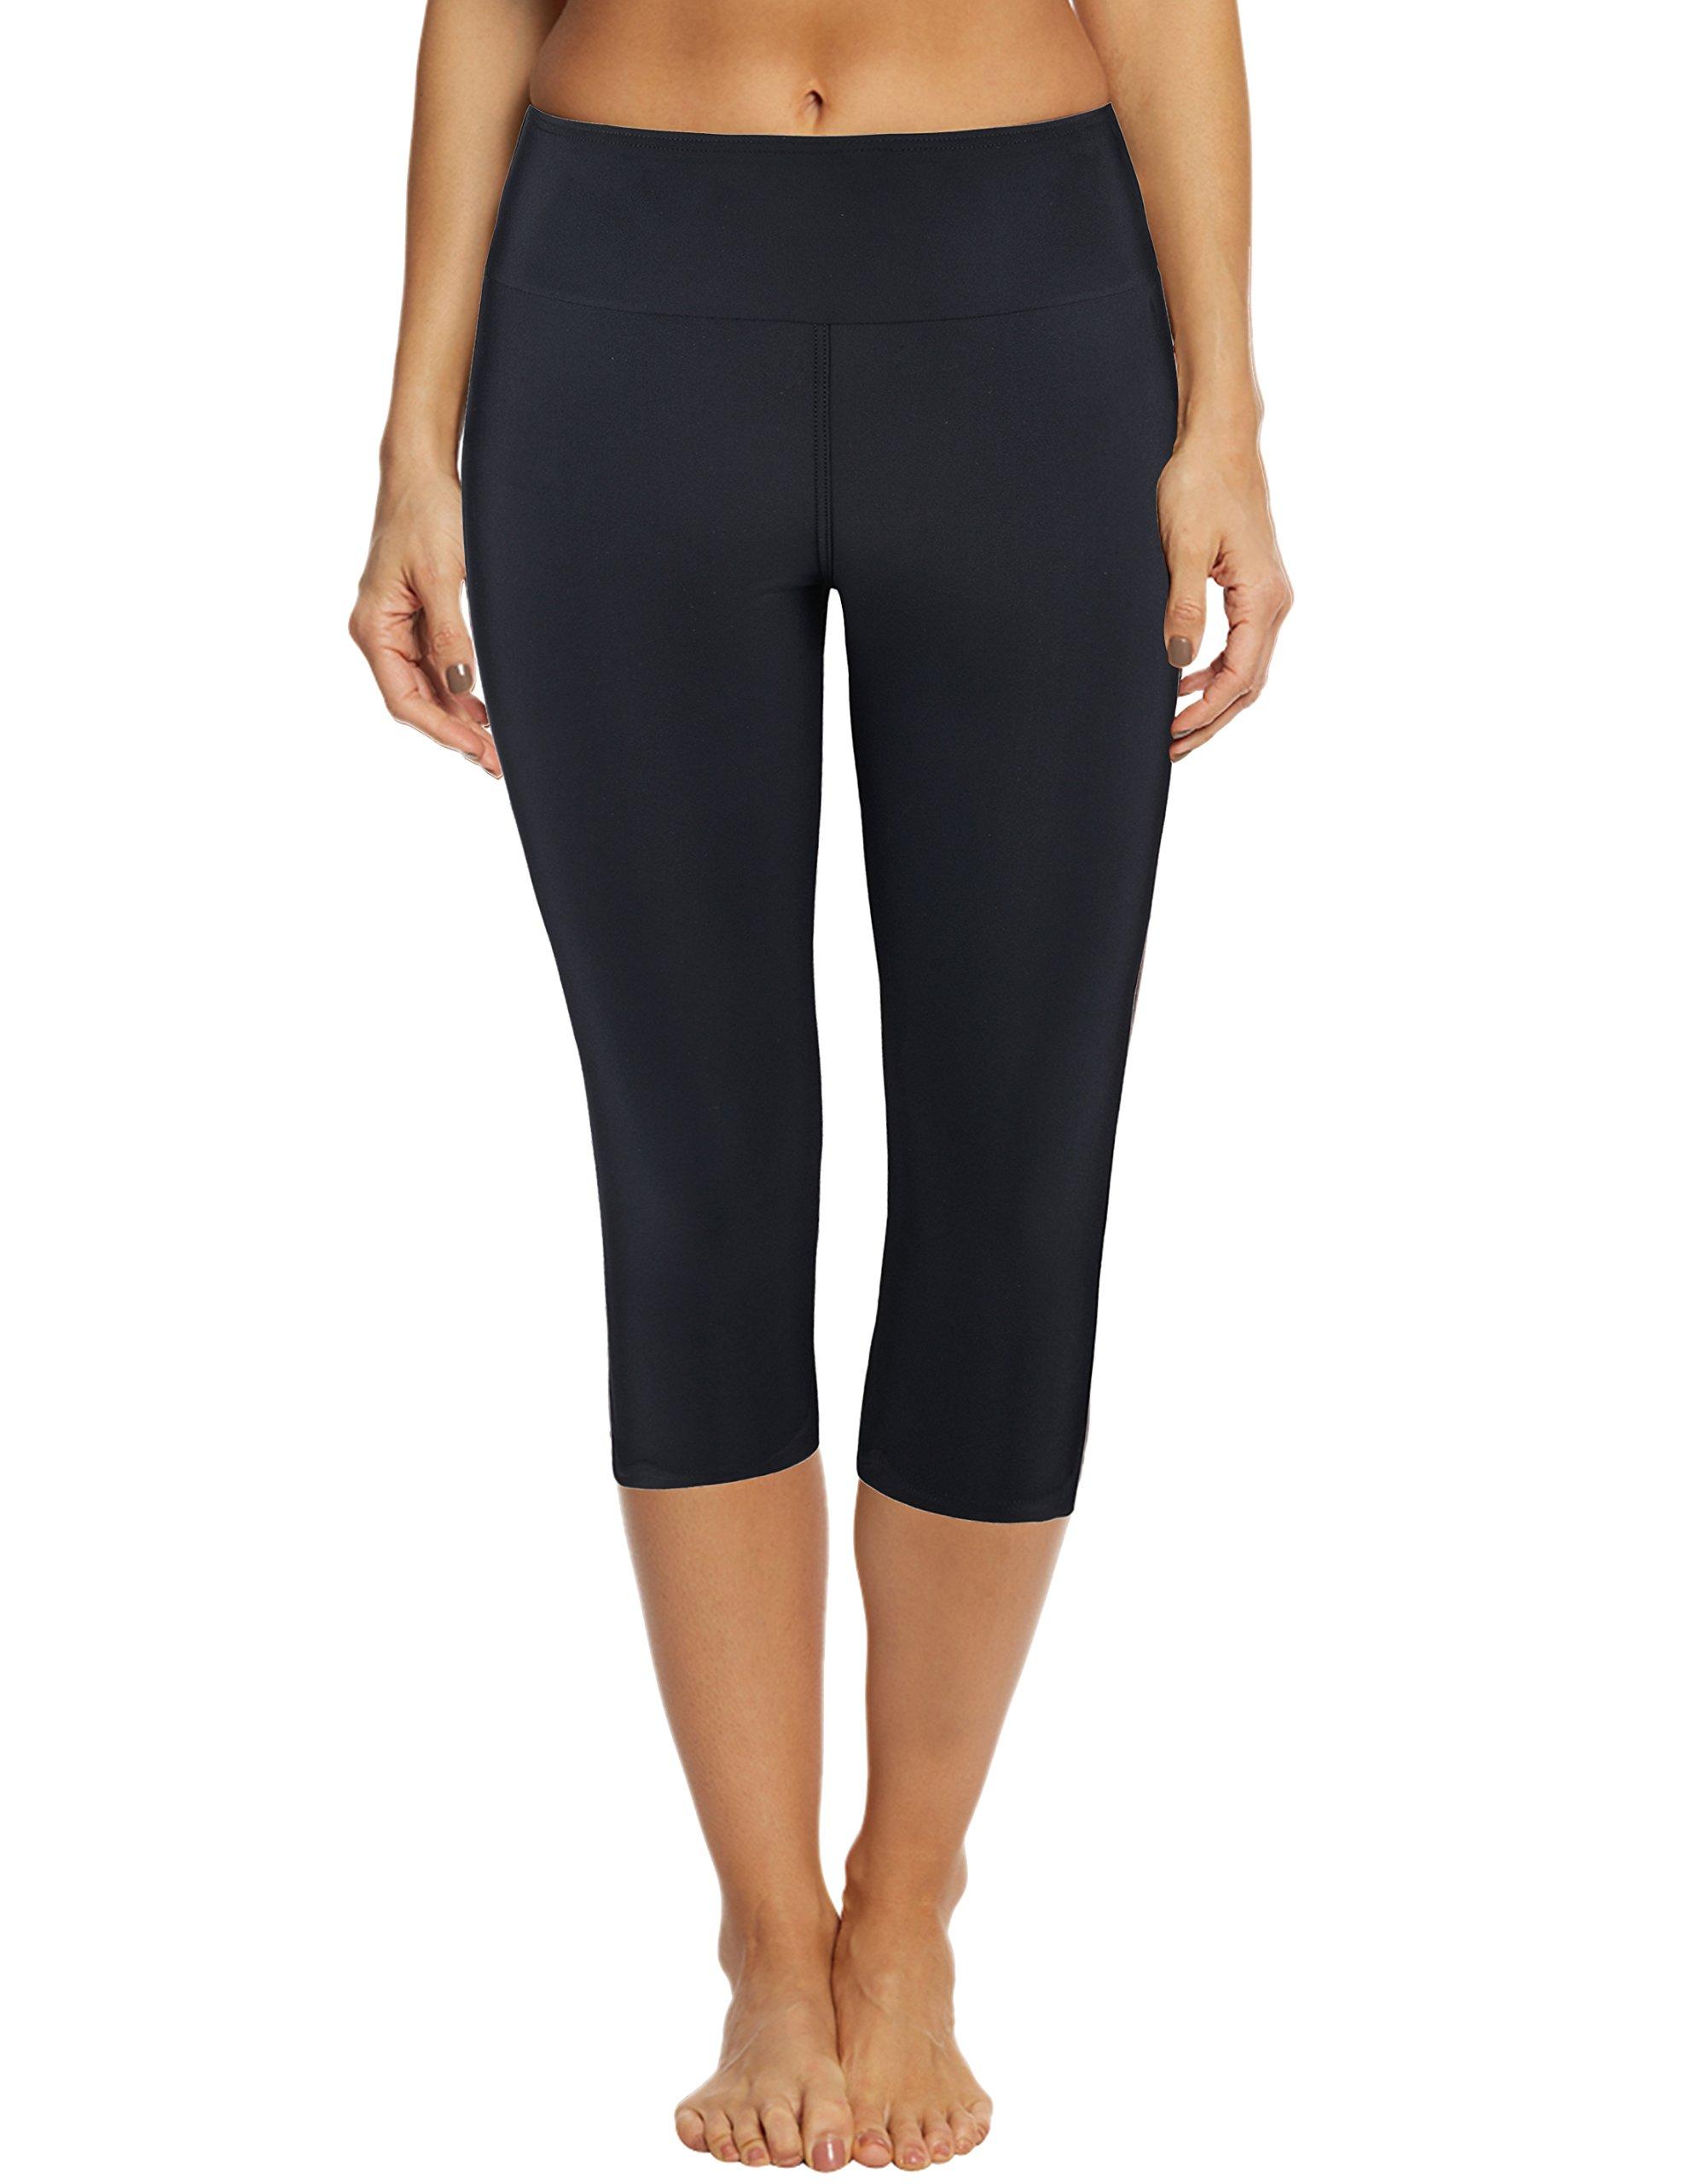 Septangle Women's Swim Capri Legging Board Shorts Swimwear(US 22, Black)